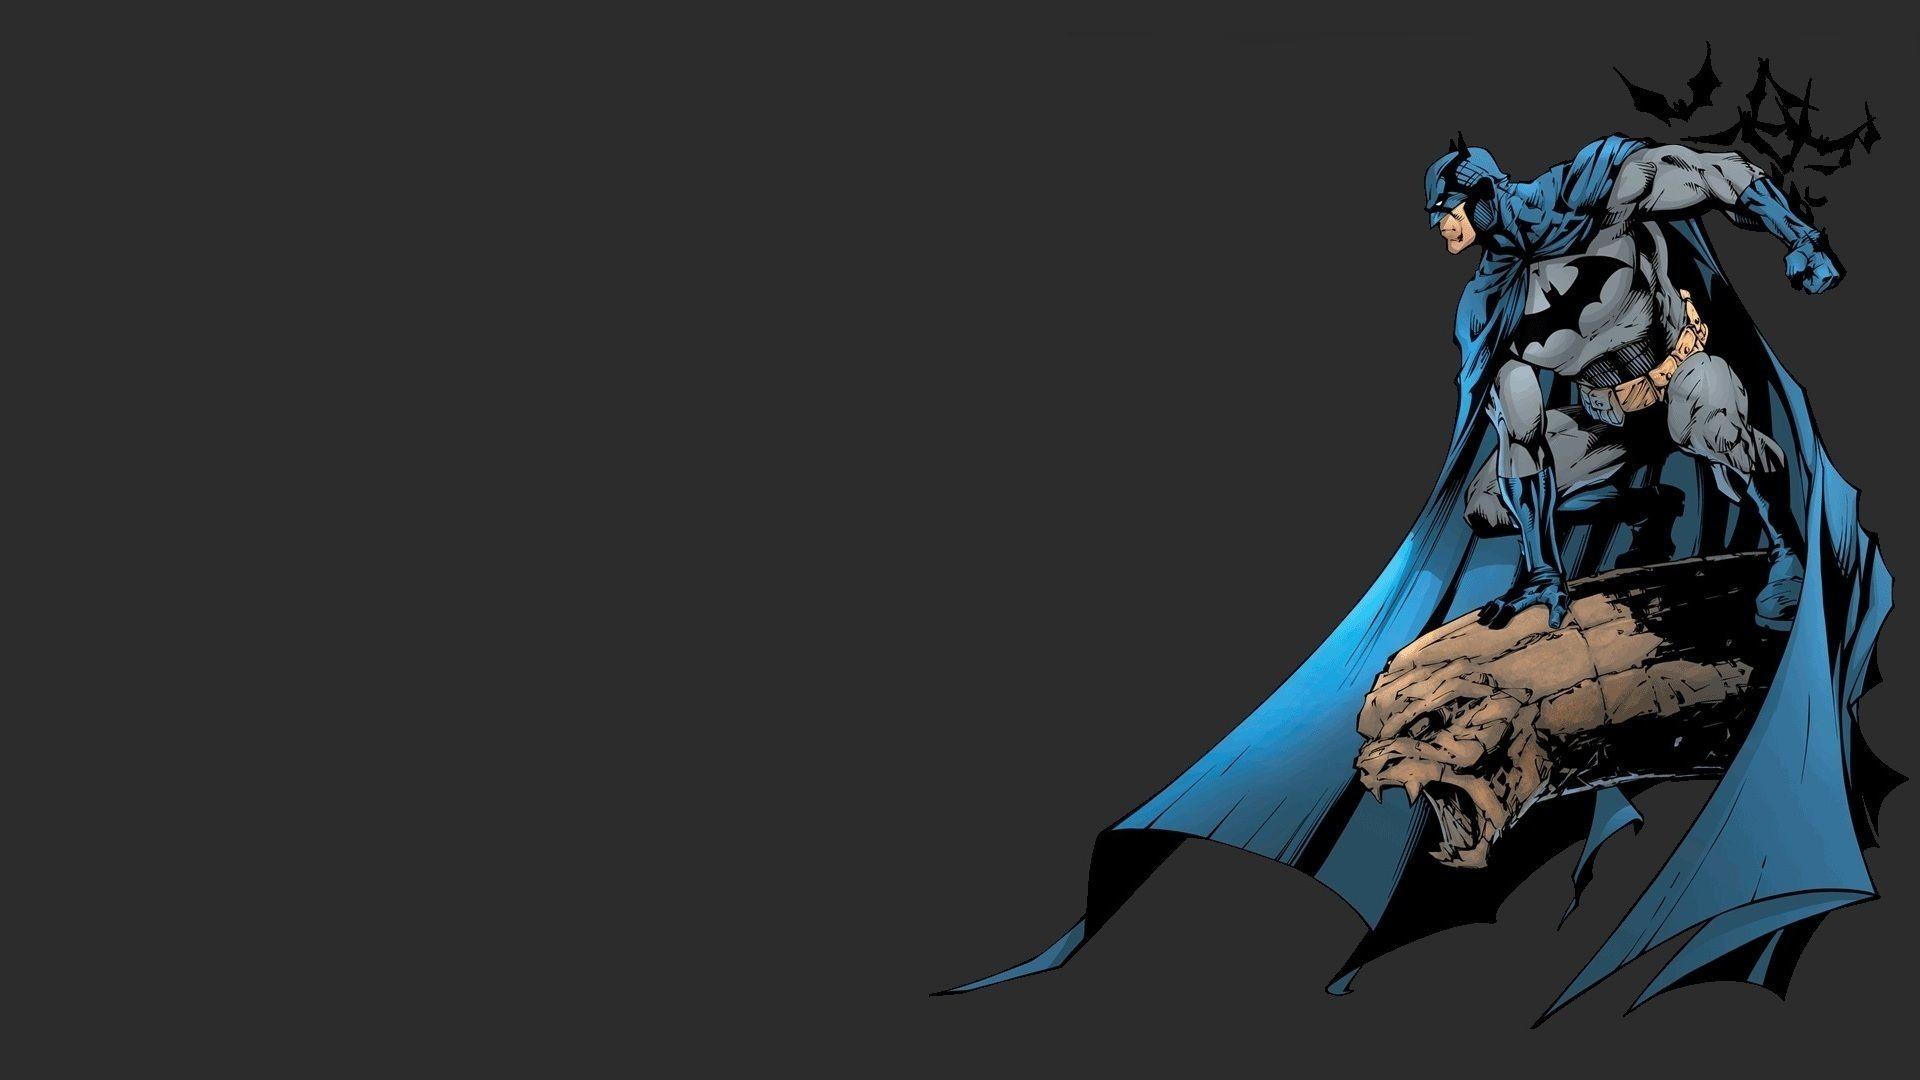 … Desktop batman wallpaper HD